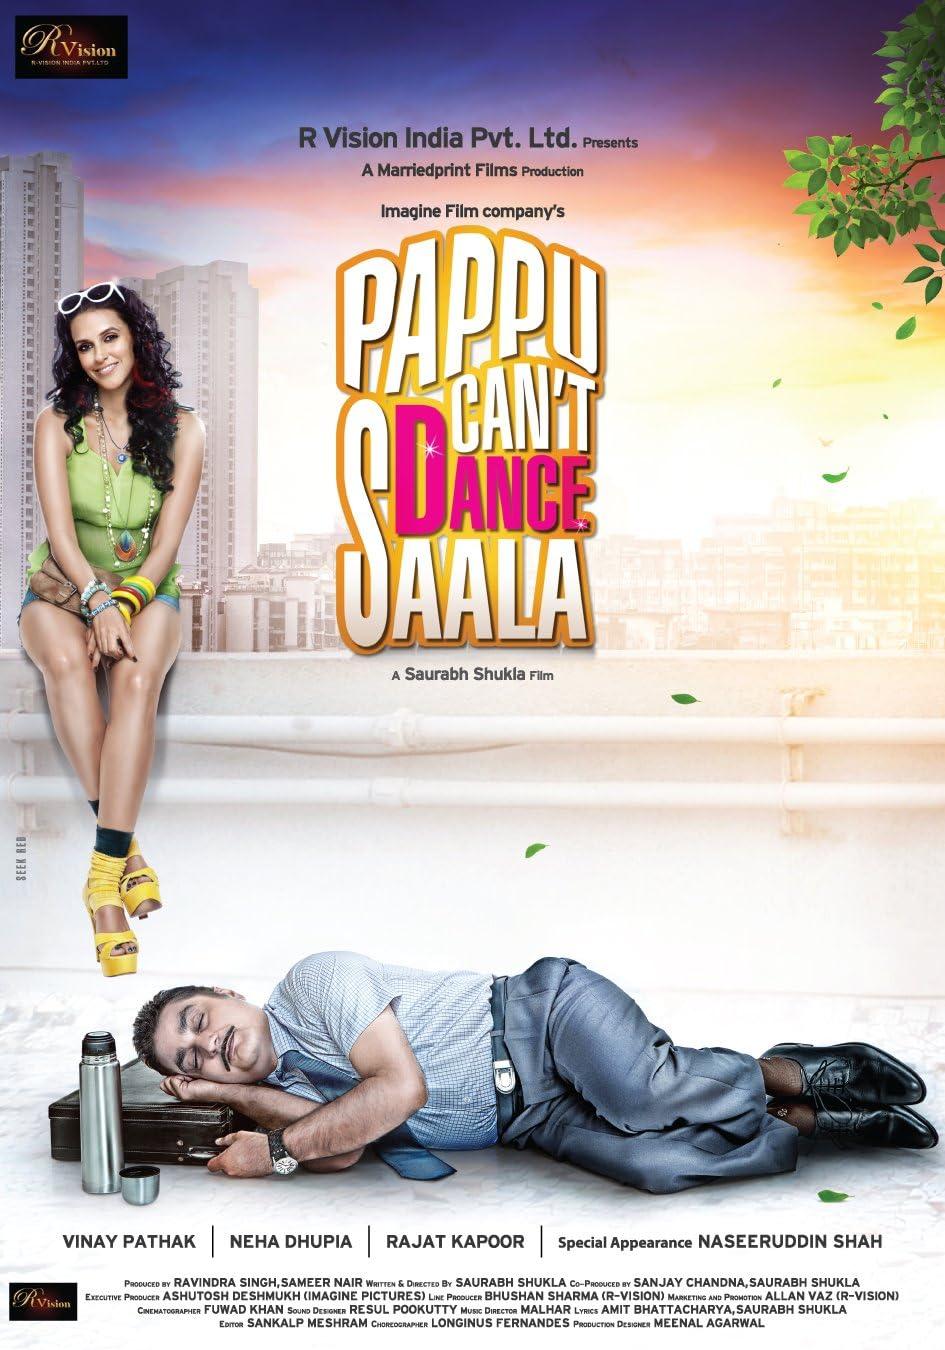 Pappu Can't Dance Saala (2010)